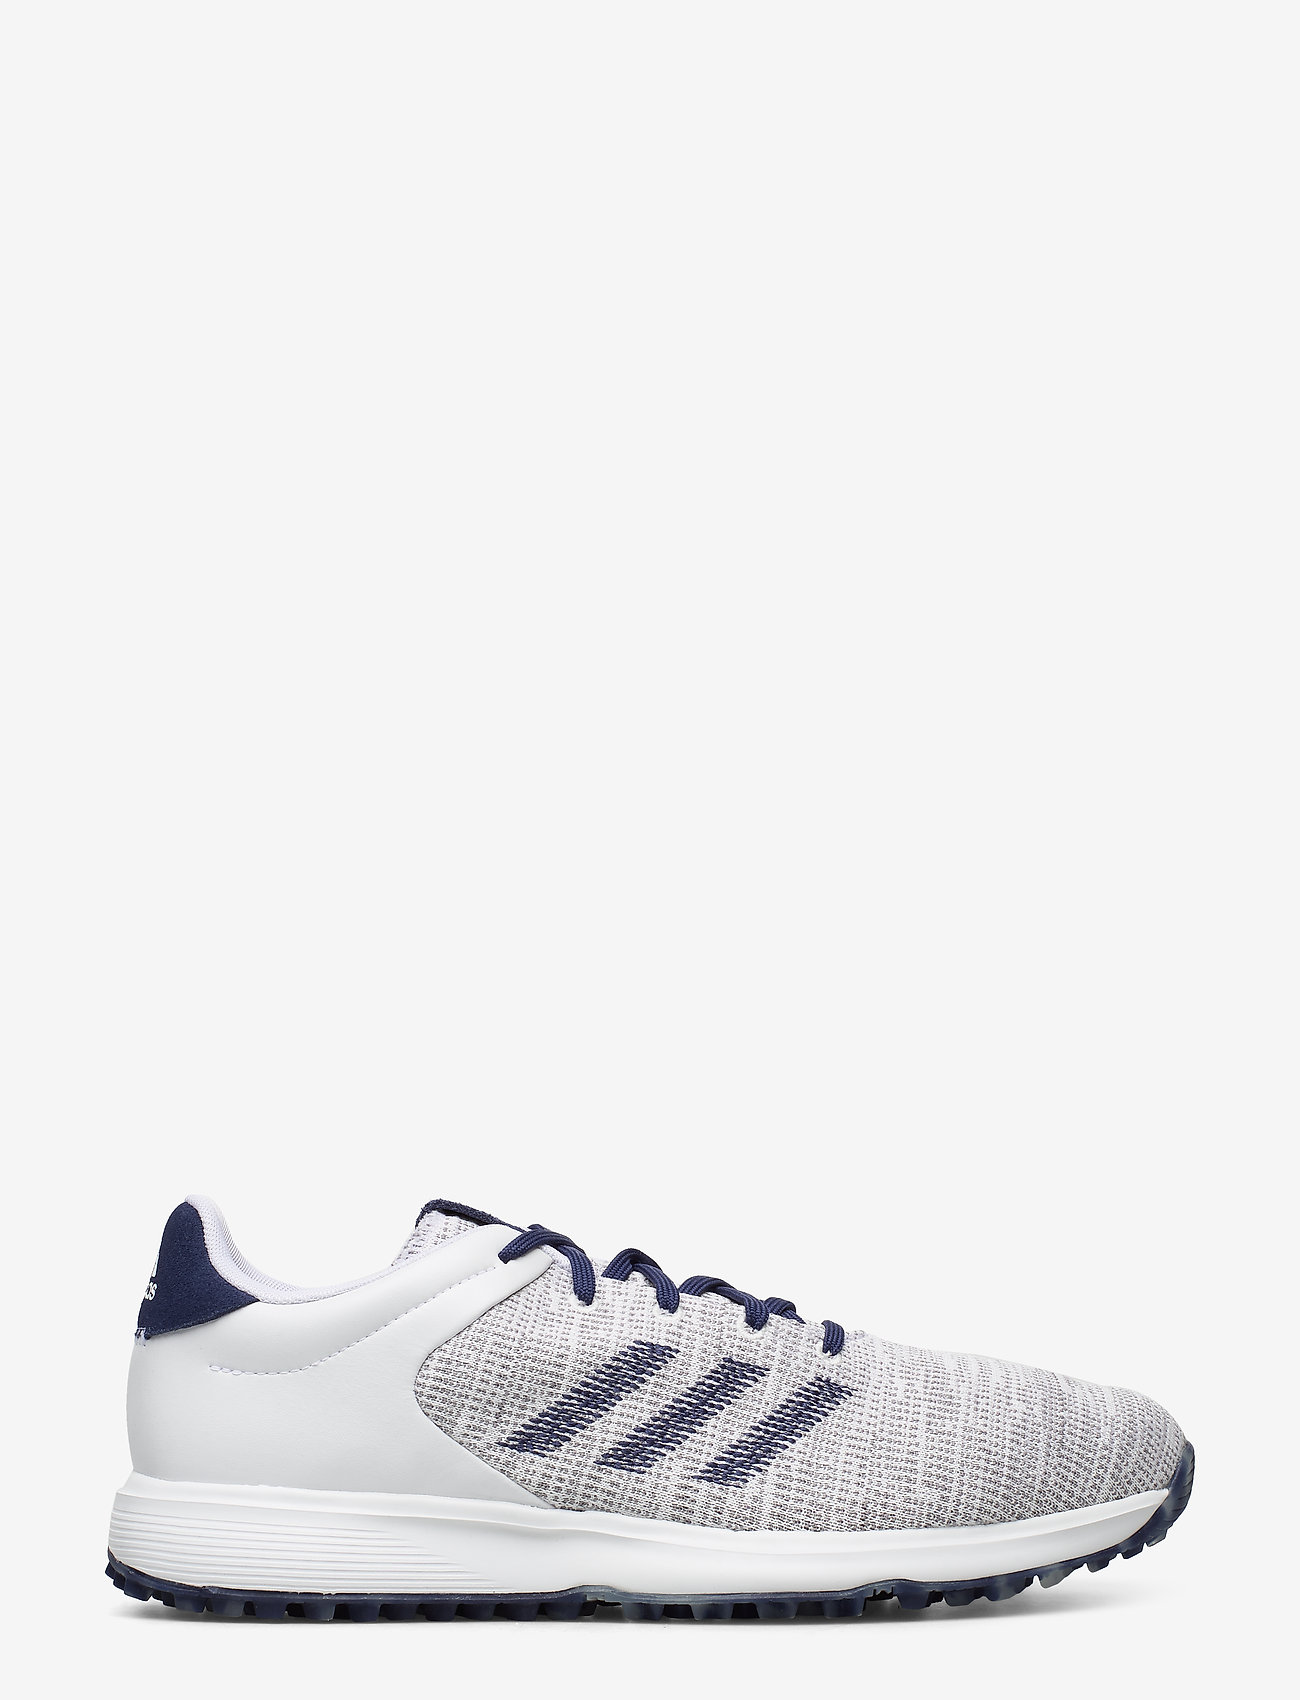 adidas Golf - S2G - golfschuhe - ftwwht/tecind/grethr - 1